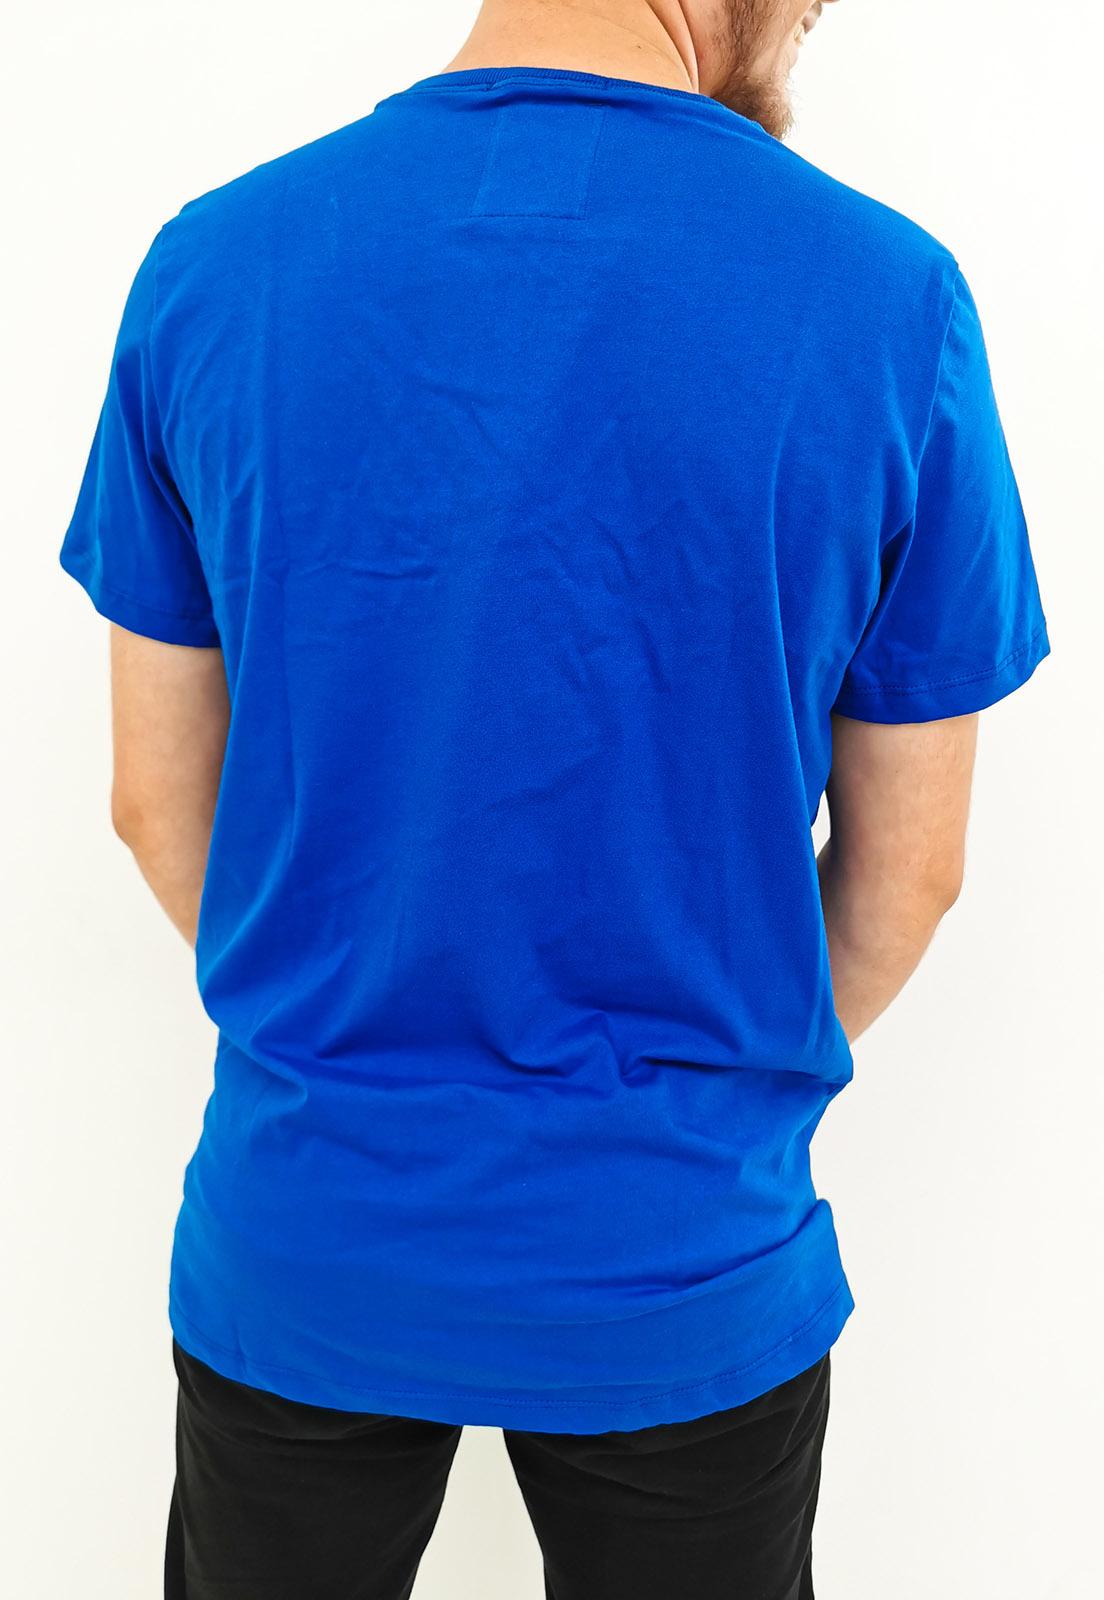 Camiseta Colcci Azul Expedition